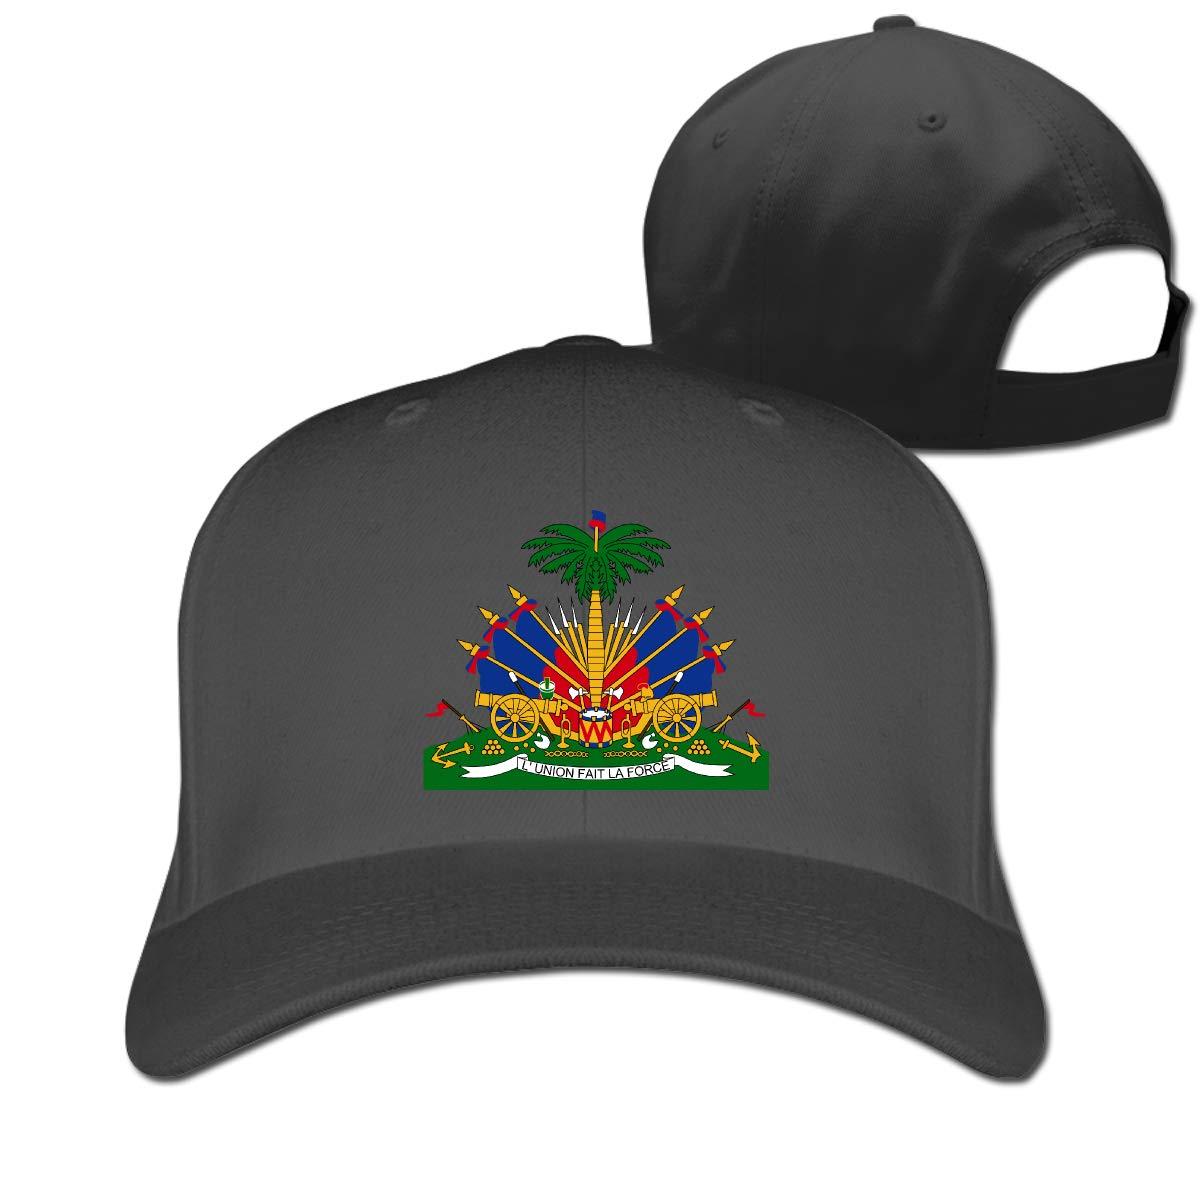 Coat of Arms of Haiti Fashion Adjustable Cotton Baseball Caps Trucker Driver Hat Outdoor Cap Black